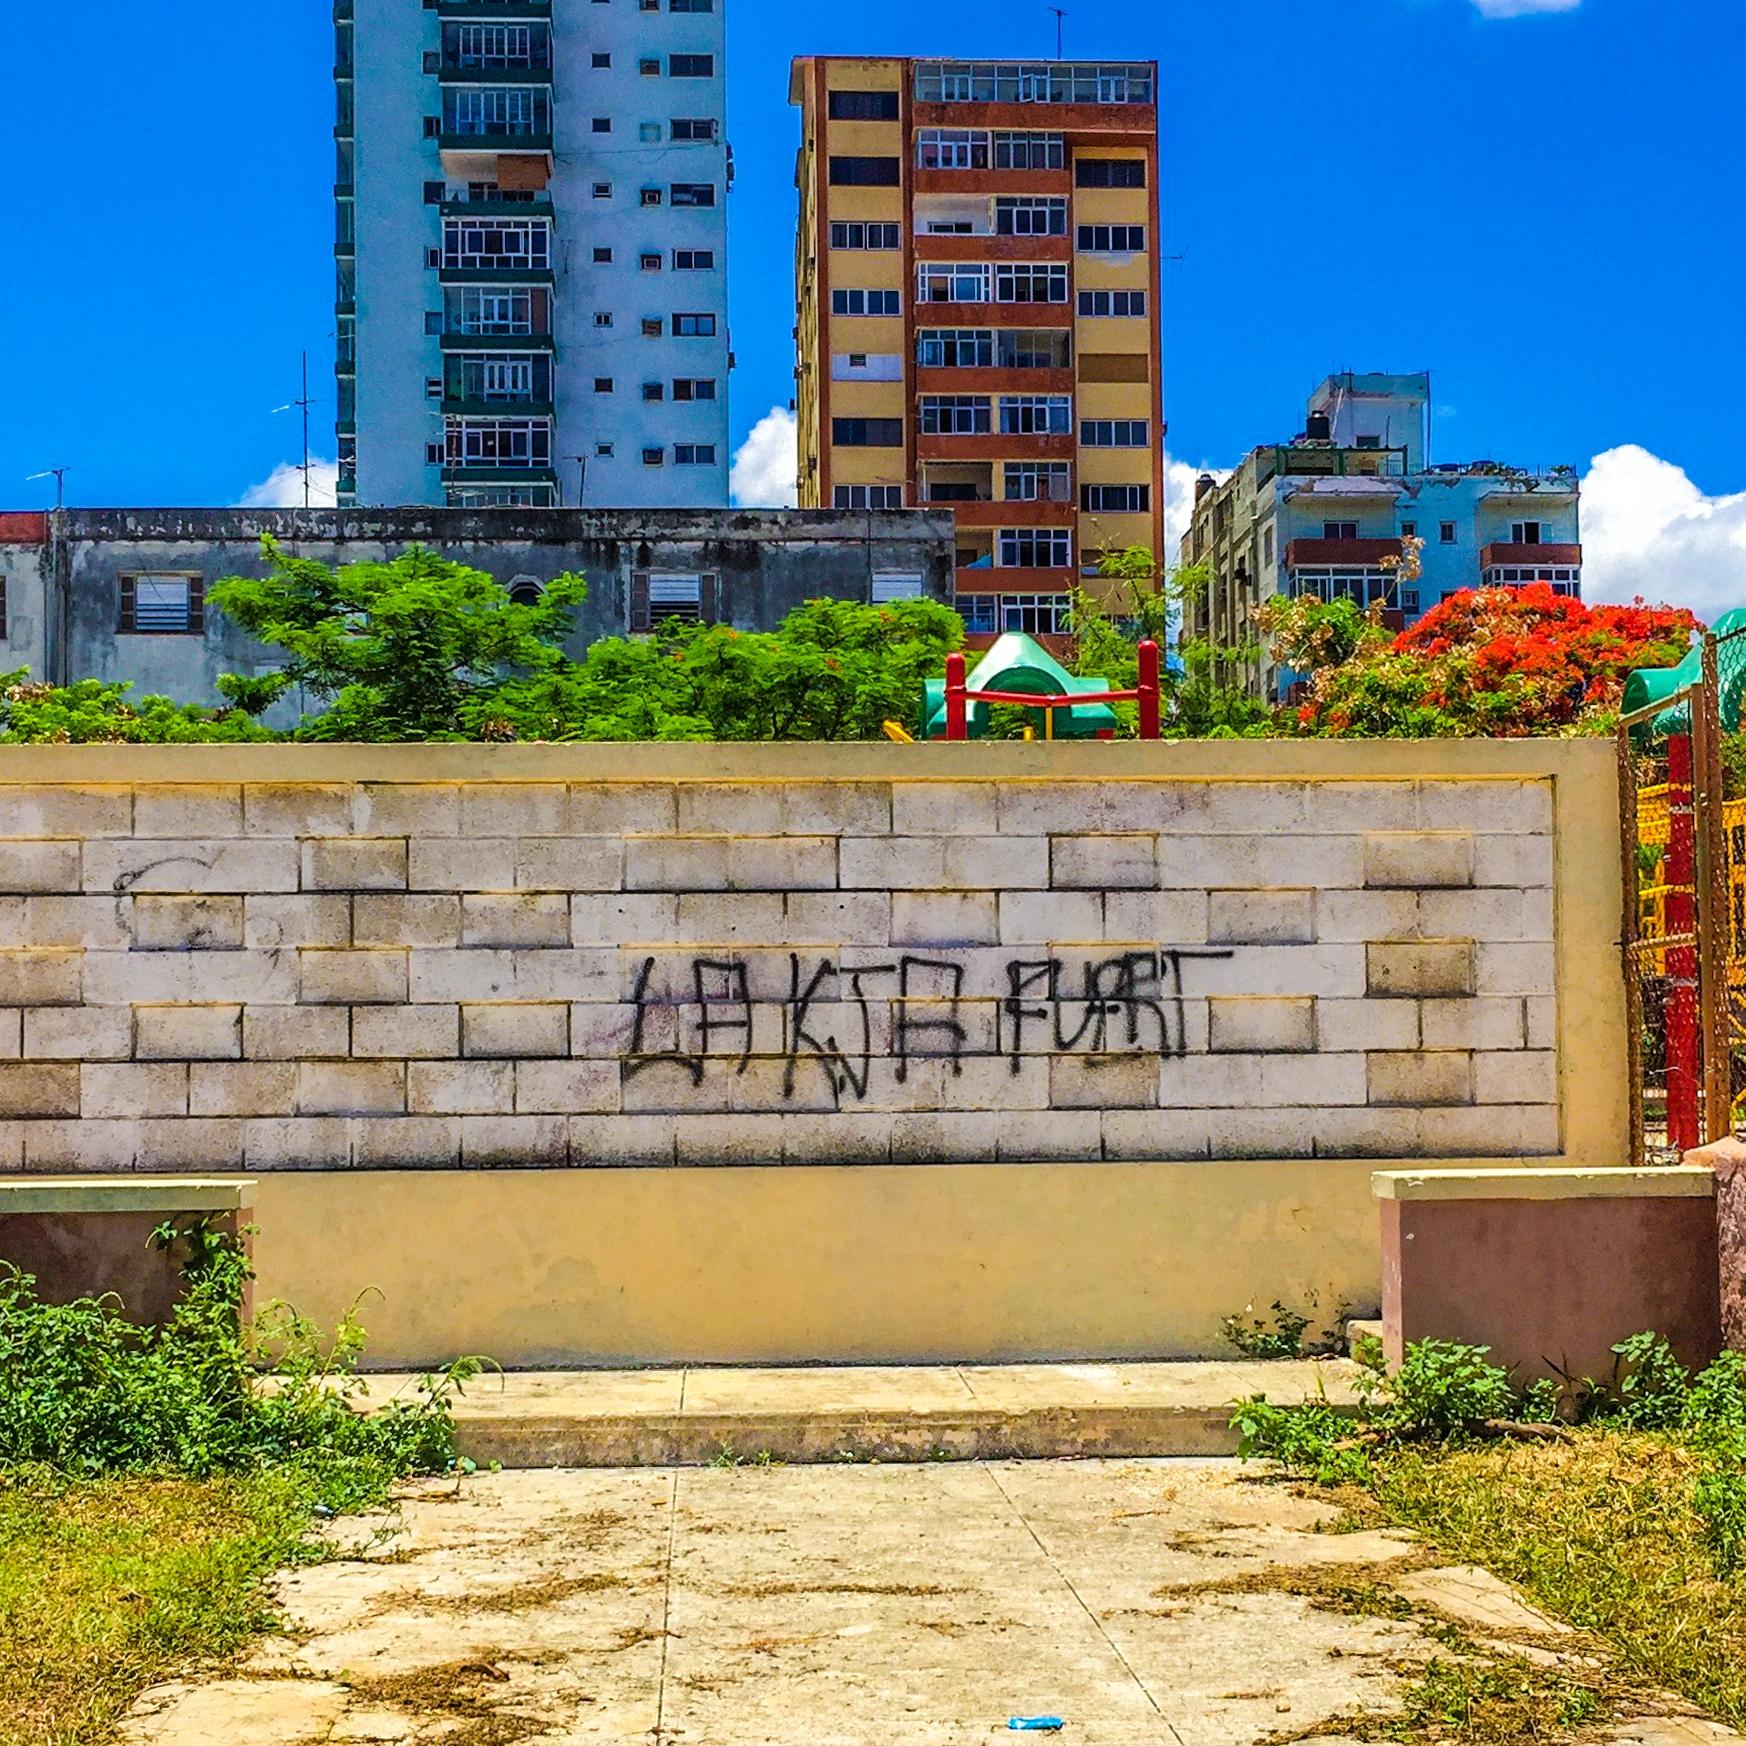 "A playground behind a wall with graffiti scrawled in skinny black aerosol saying ""La Kja Fuert"""